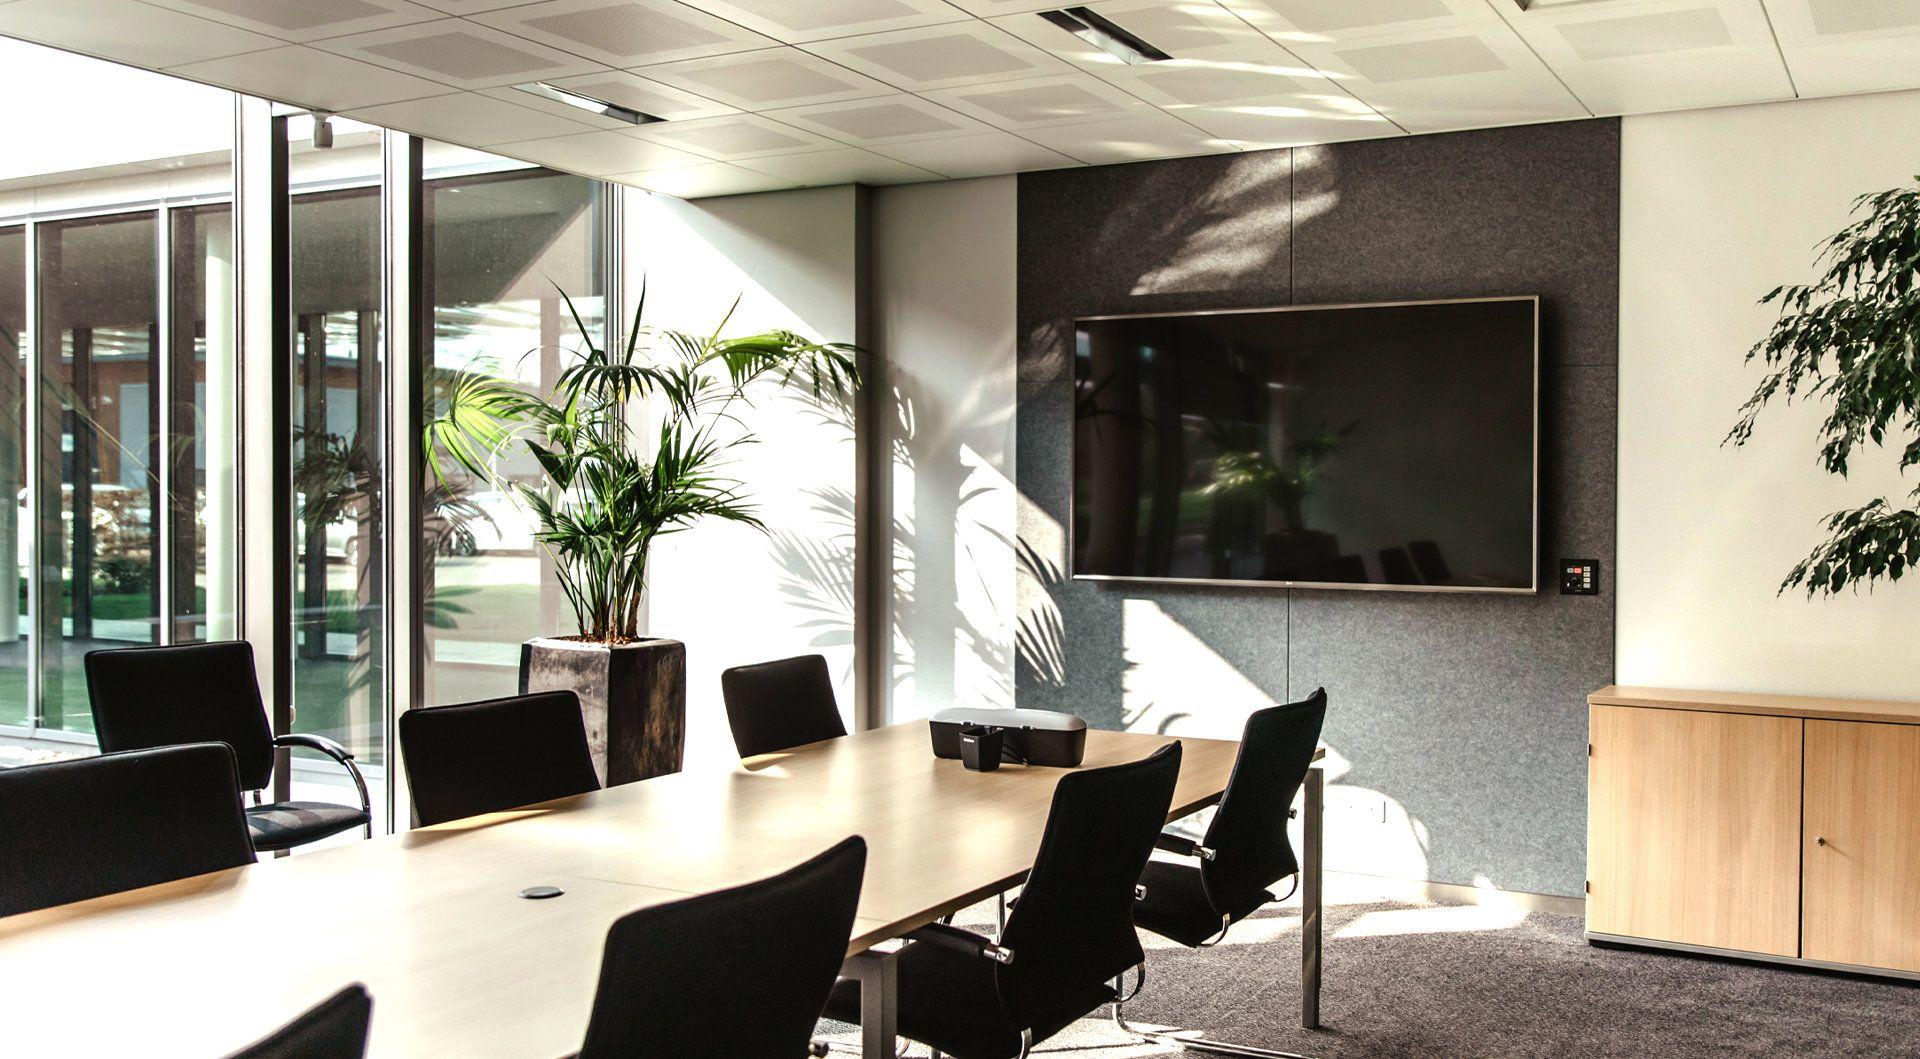 "Chief PRSU flat panel vloer standaard 182,9 cm (72"") Vaste flatscreen vloerstandaard Zwart - Case studie de vries"